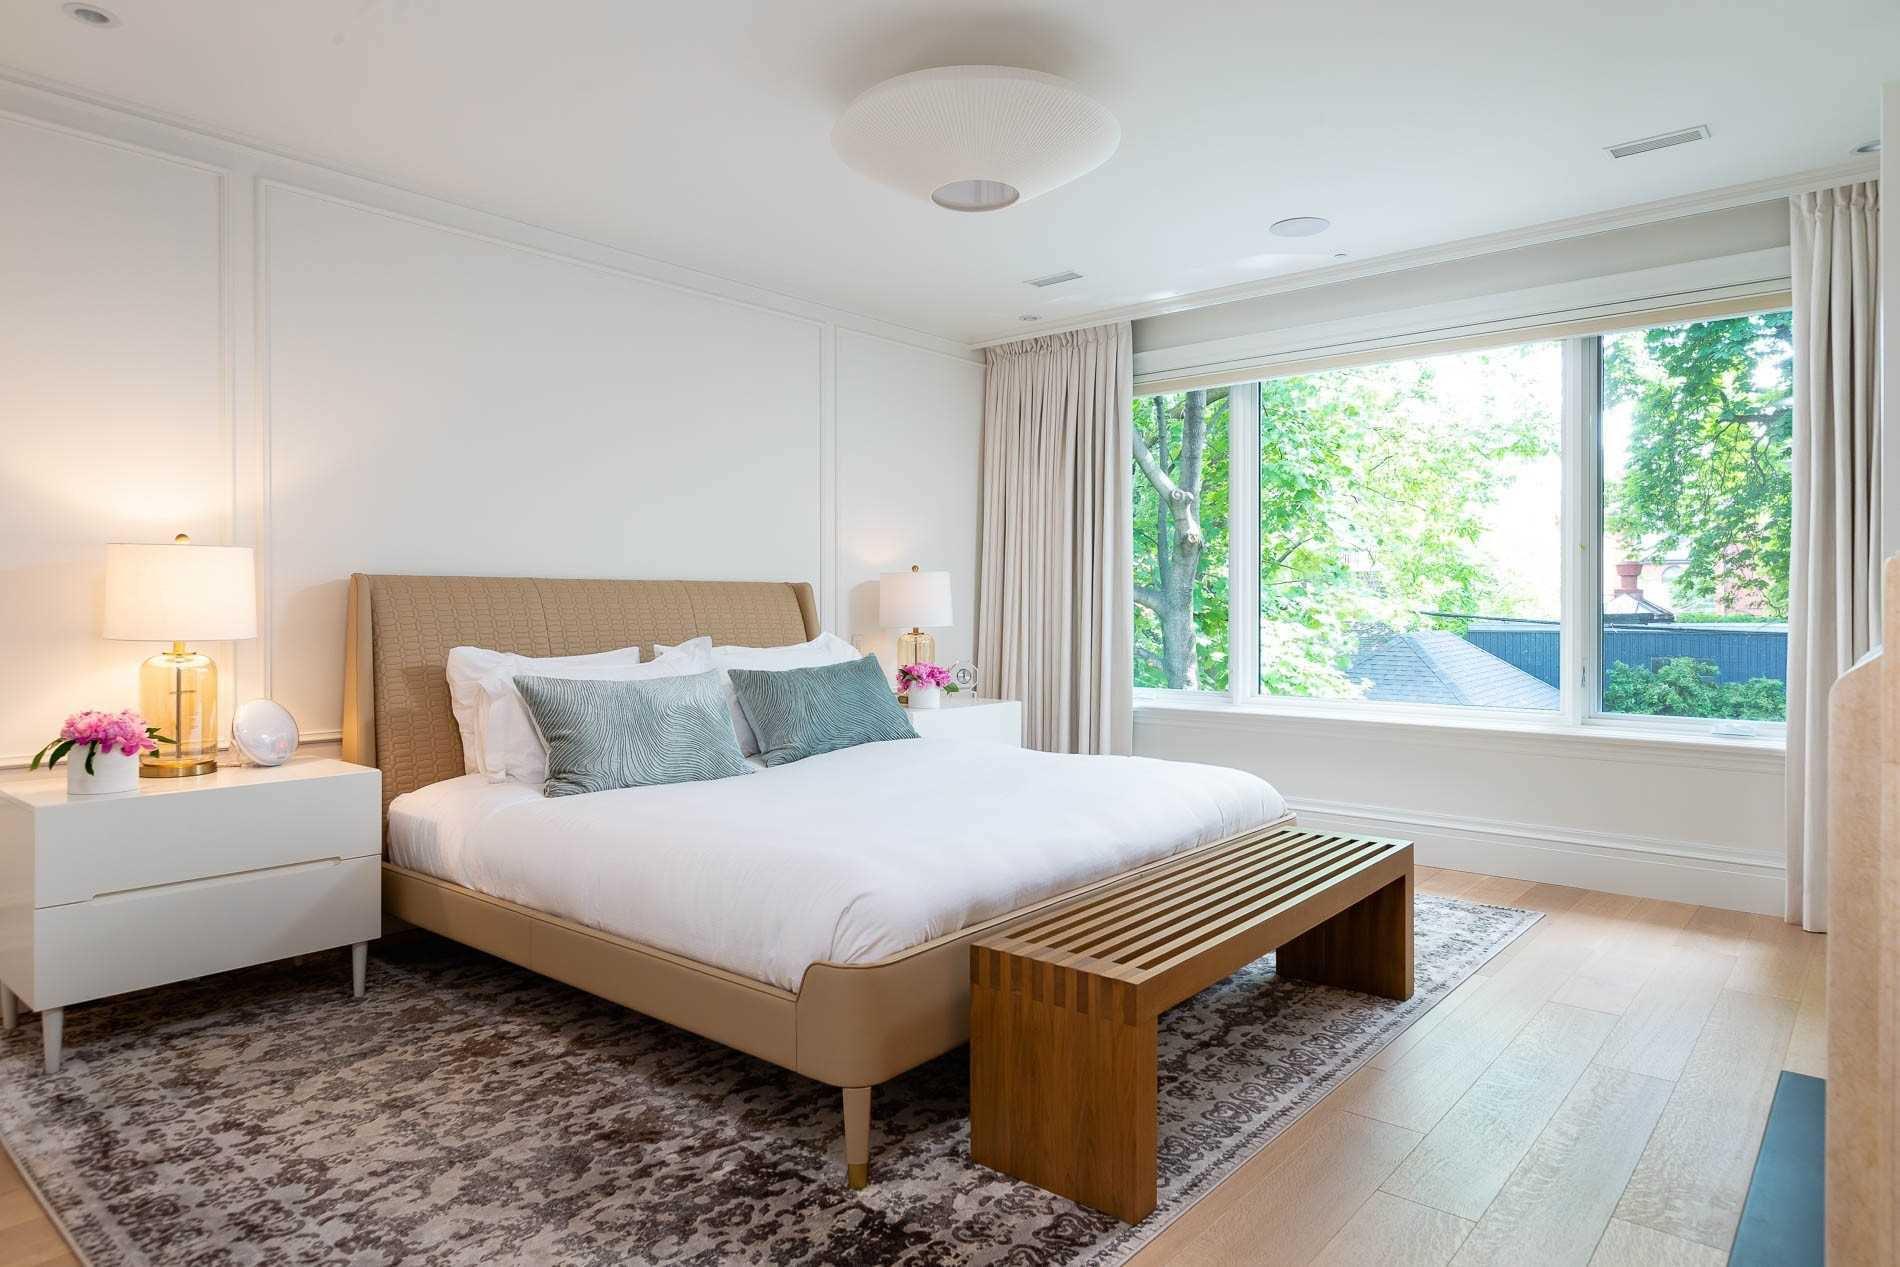 Photo 12: Photos: 45 Admiral Road in Toronto: Annex House (3-Storey) for sale (Toronto C02)  : MLS®# C4612730